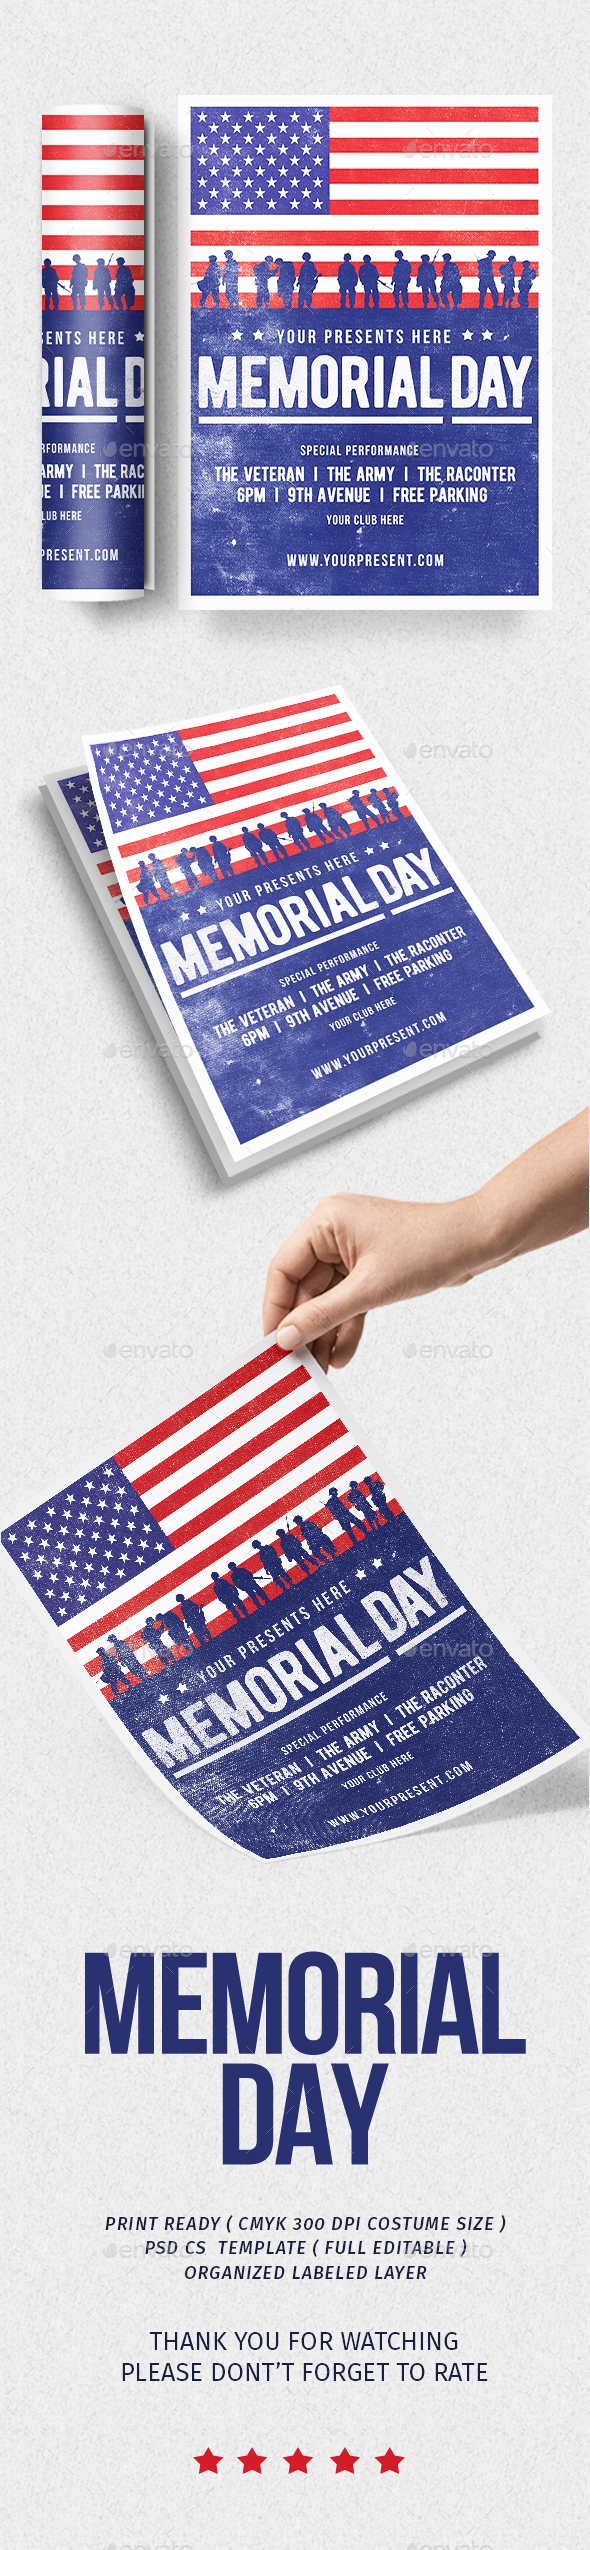 Memorial Day Flyer vol.2 - Flyers Print Templates